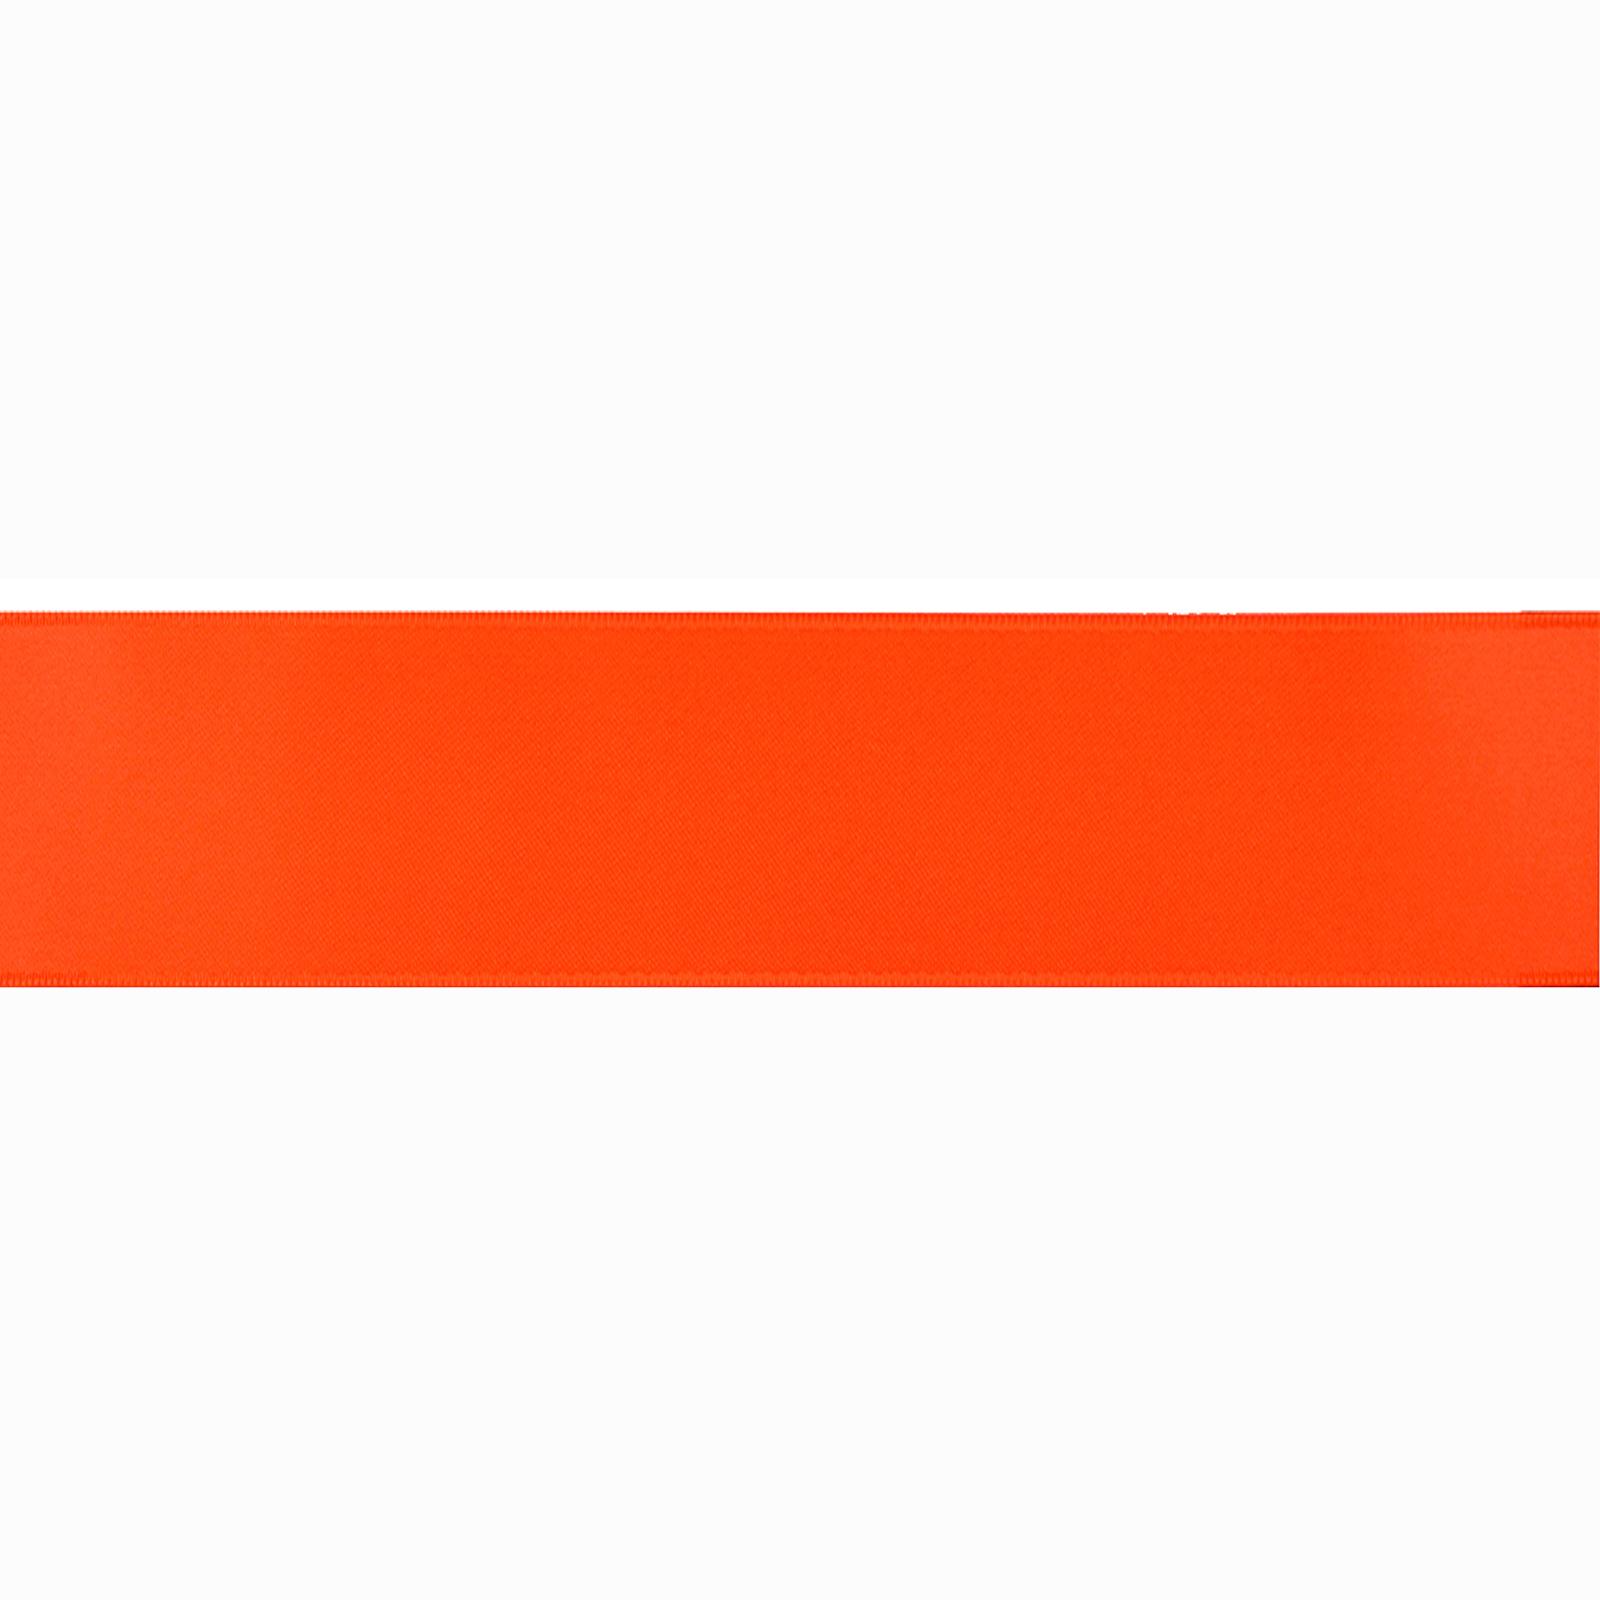 REStyle Satijnlint Fluor/Neon Oranje-9998